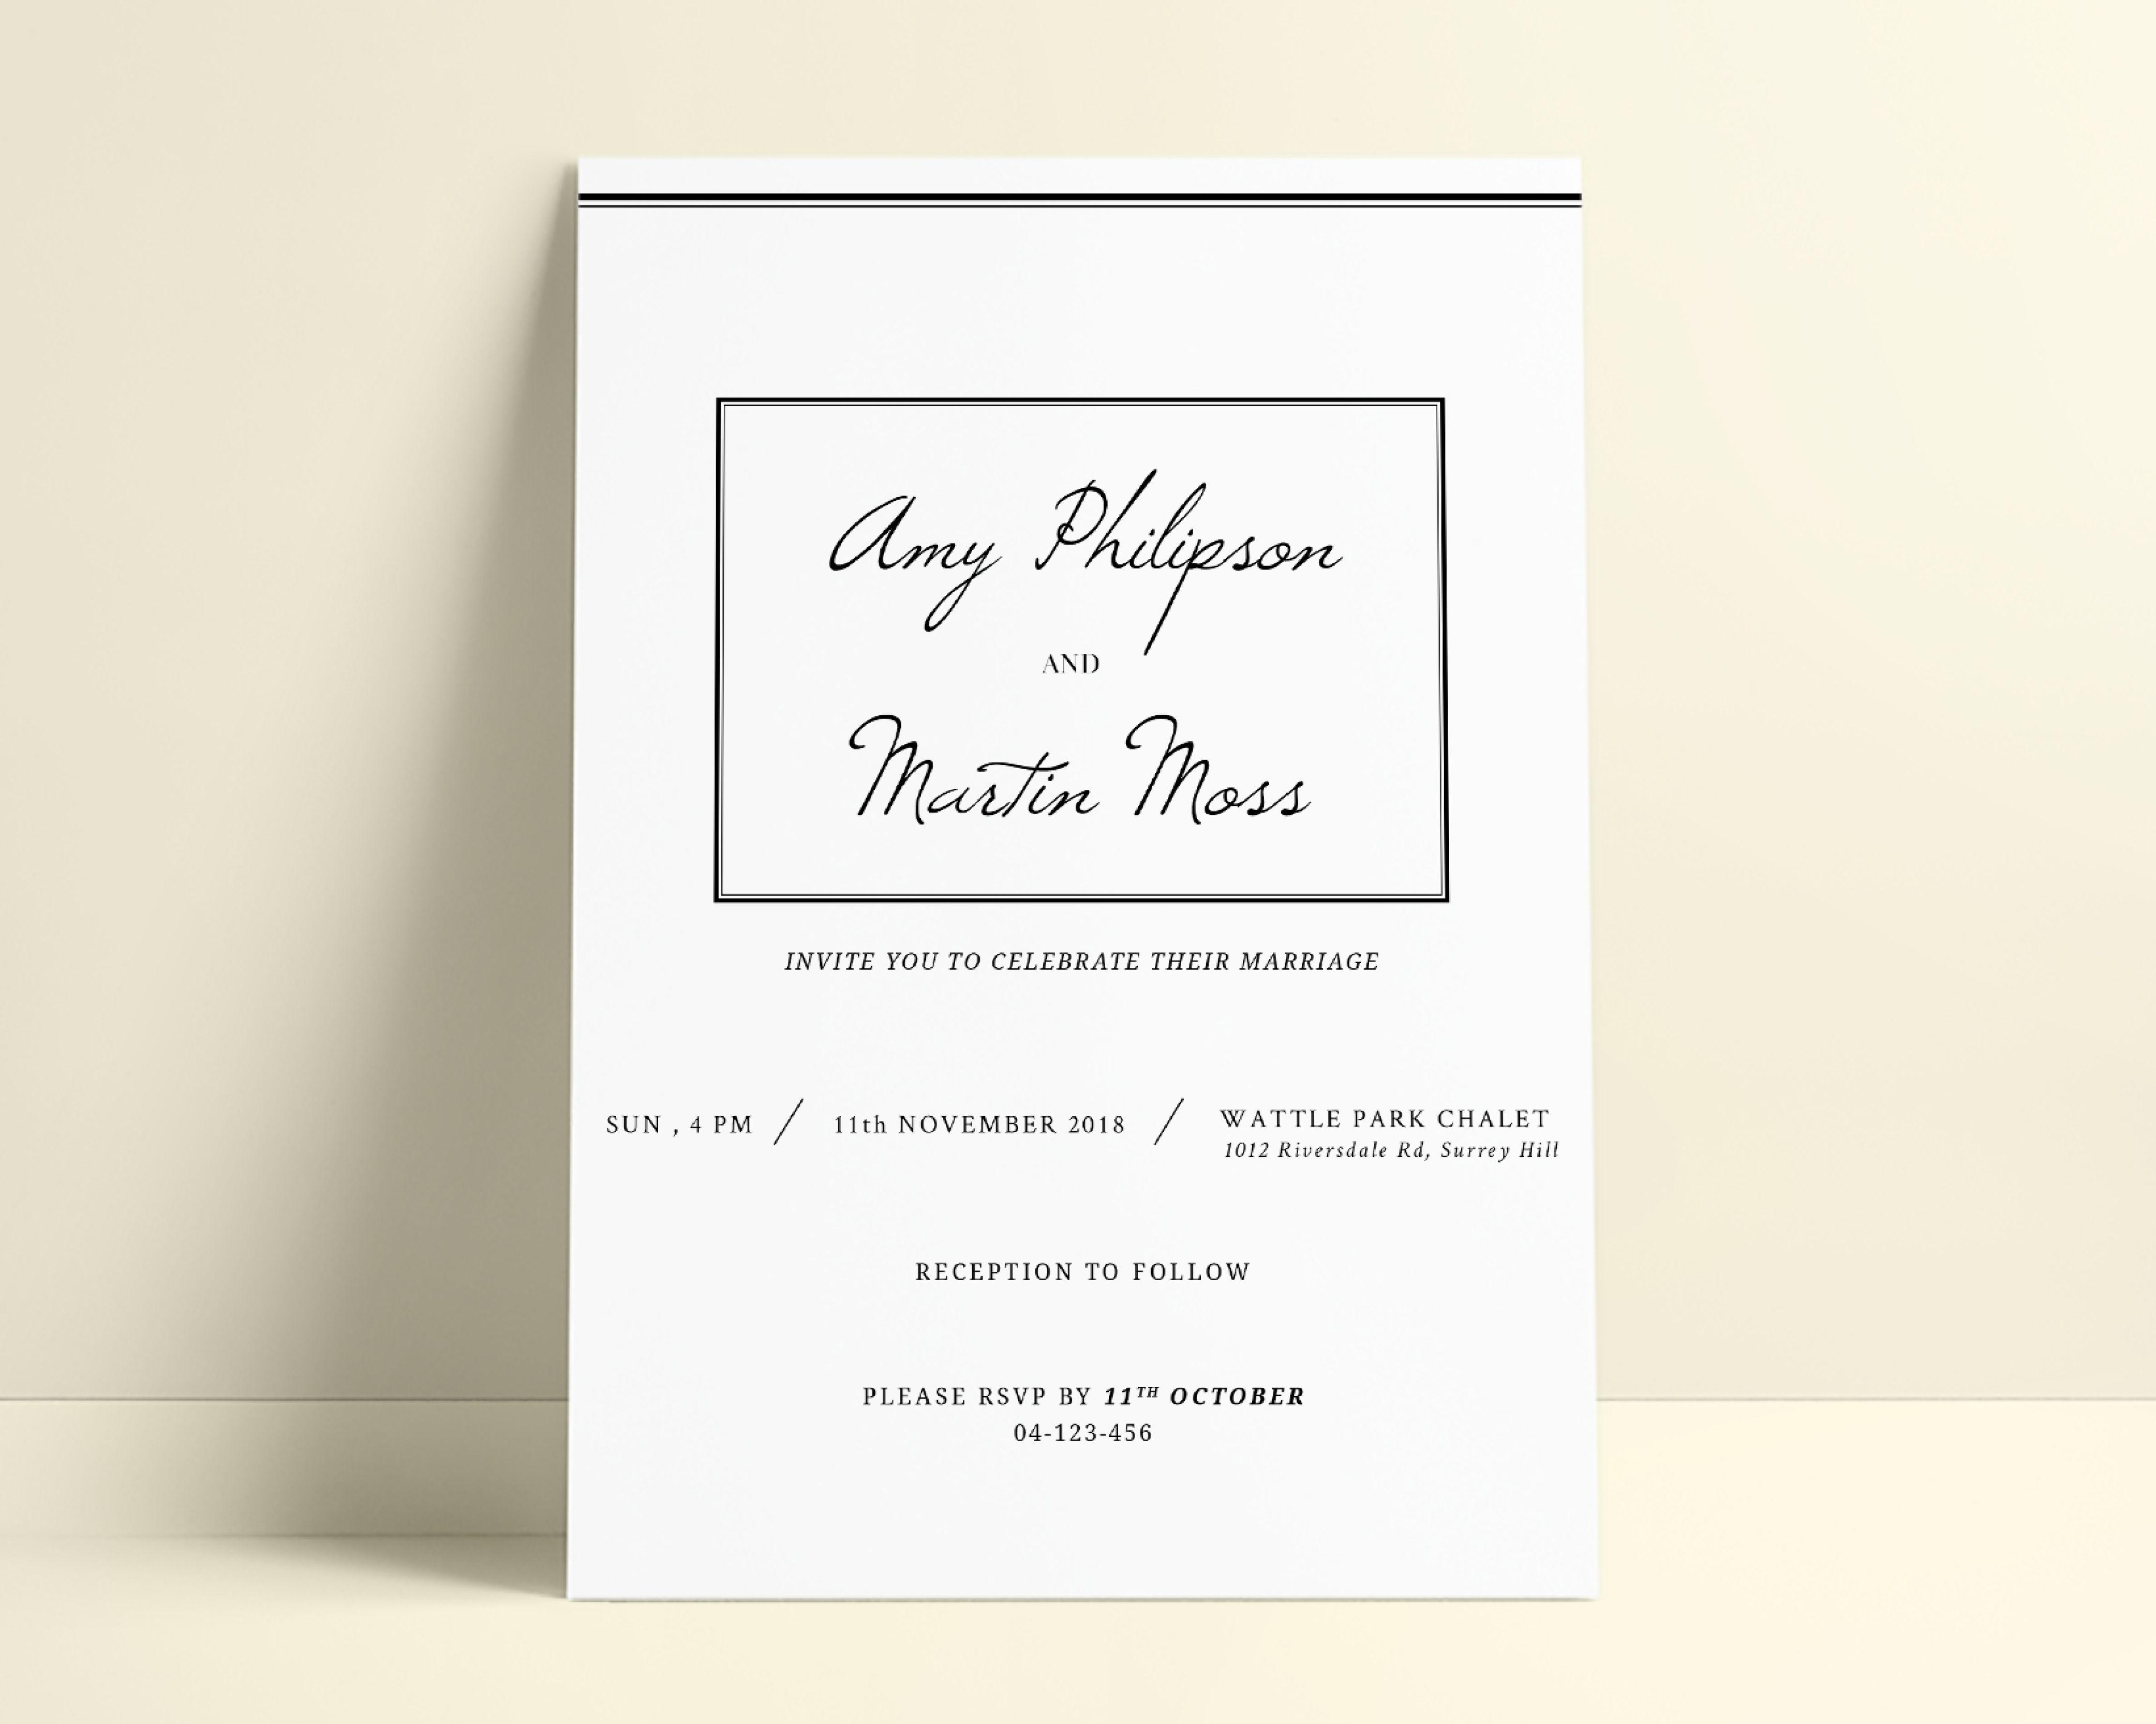 Minimalist Simple Classy Modern Wedding Invitation Template